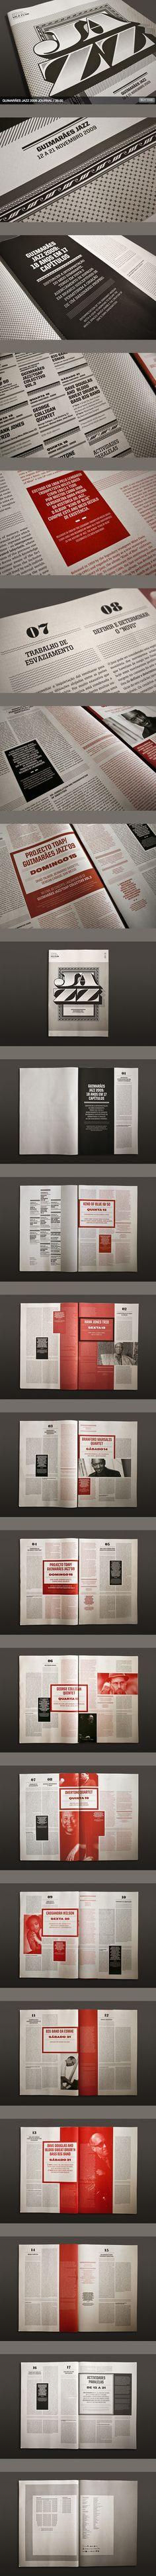 The Jazz 09 Journal by Atelier Martinoña , via Behance [damn beautiful]